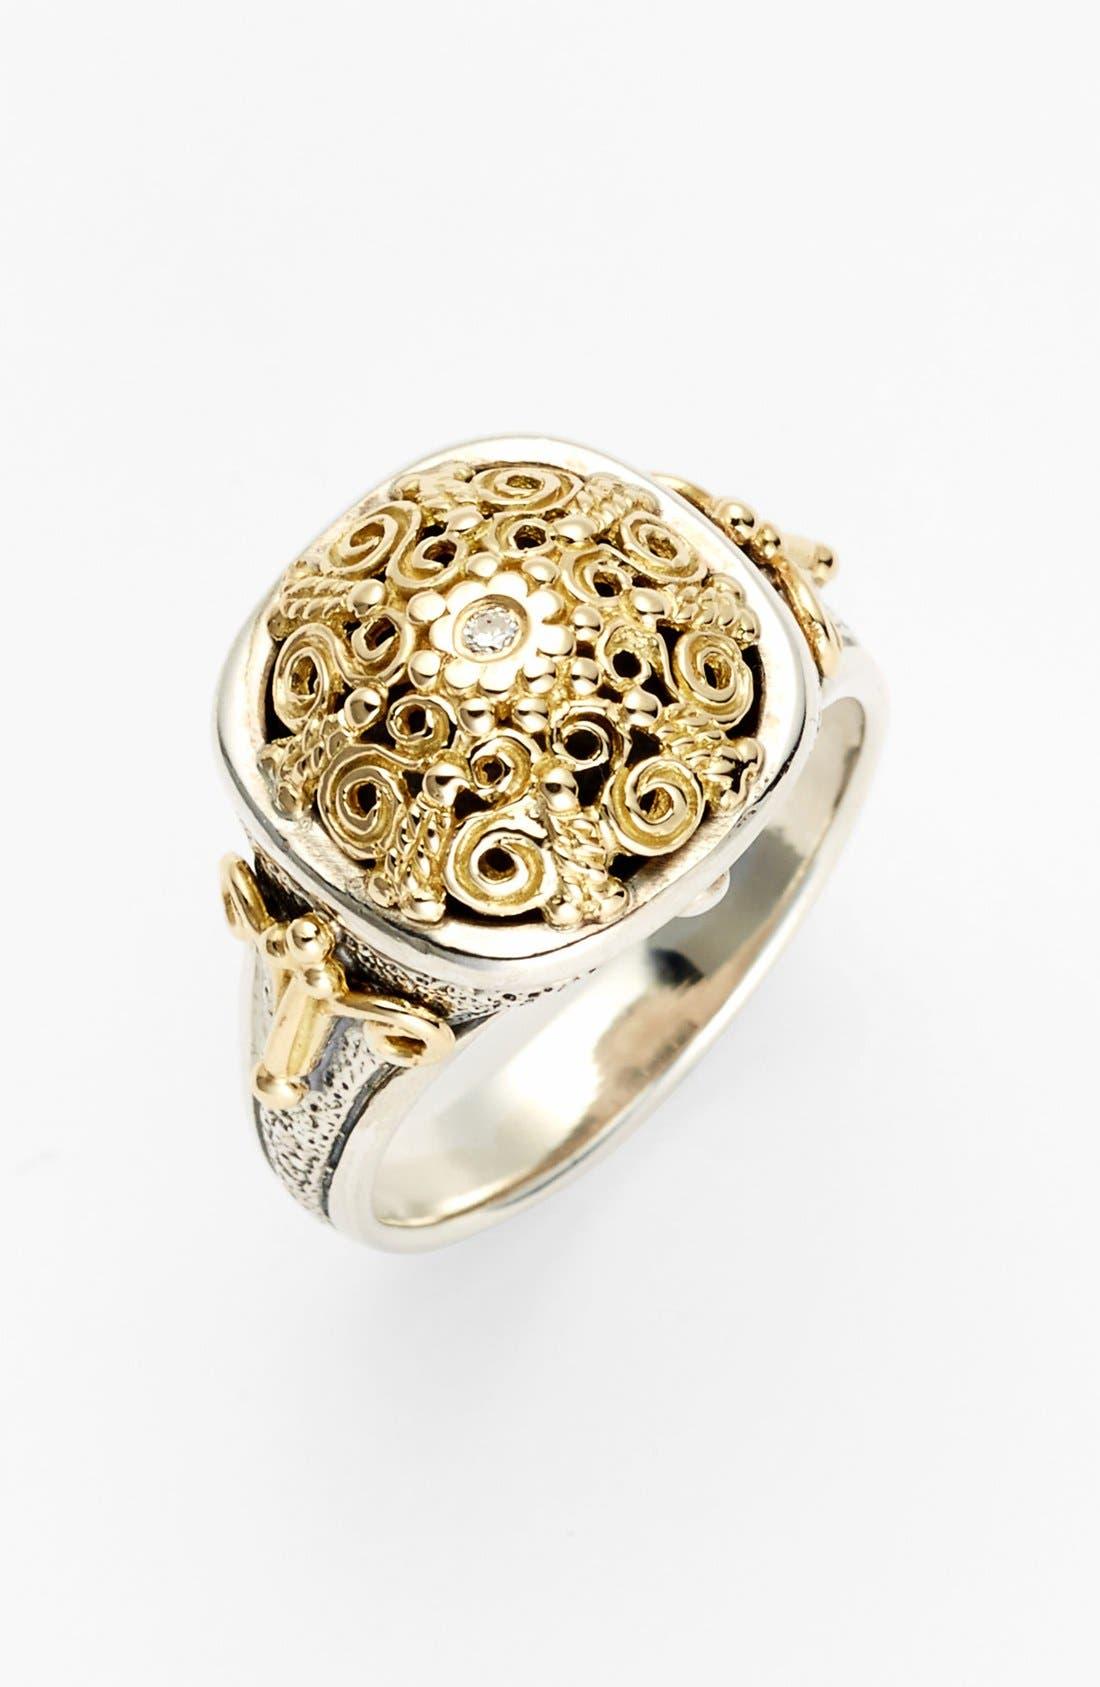 'Classics' Two-Tone Diamond Ring,                             Main thumbnail 1, color,                             SILVER/ GOLD